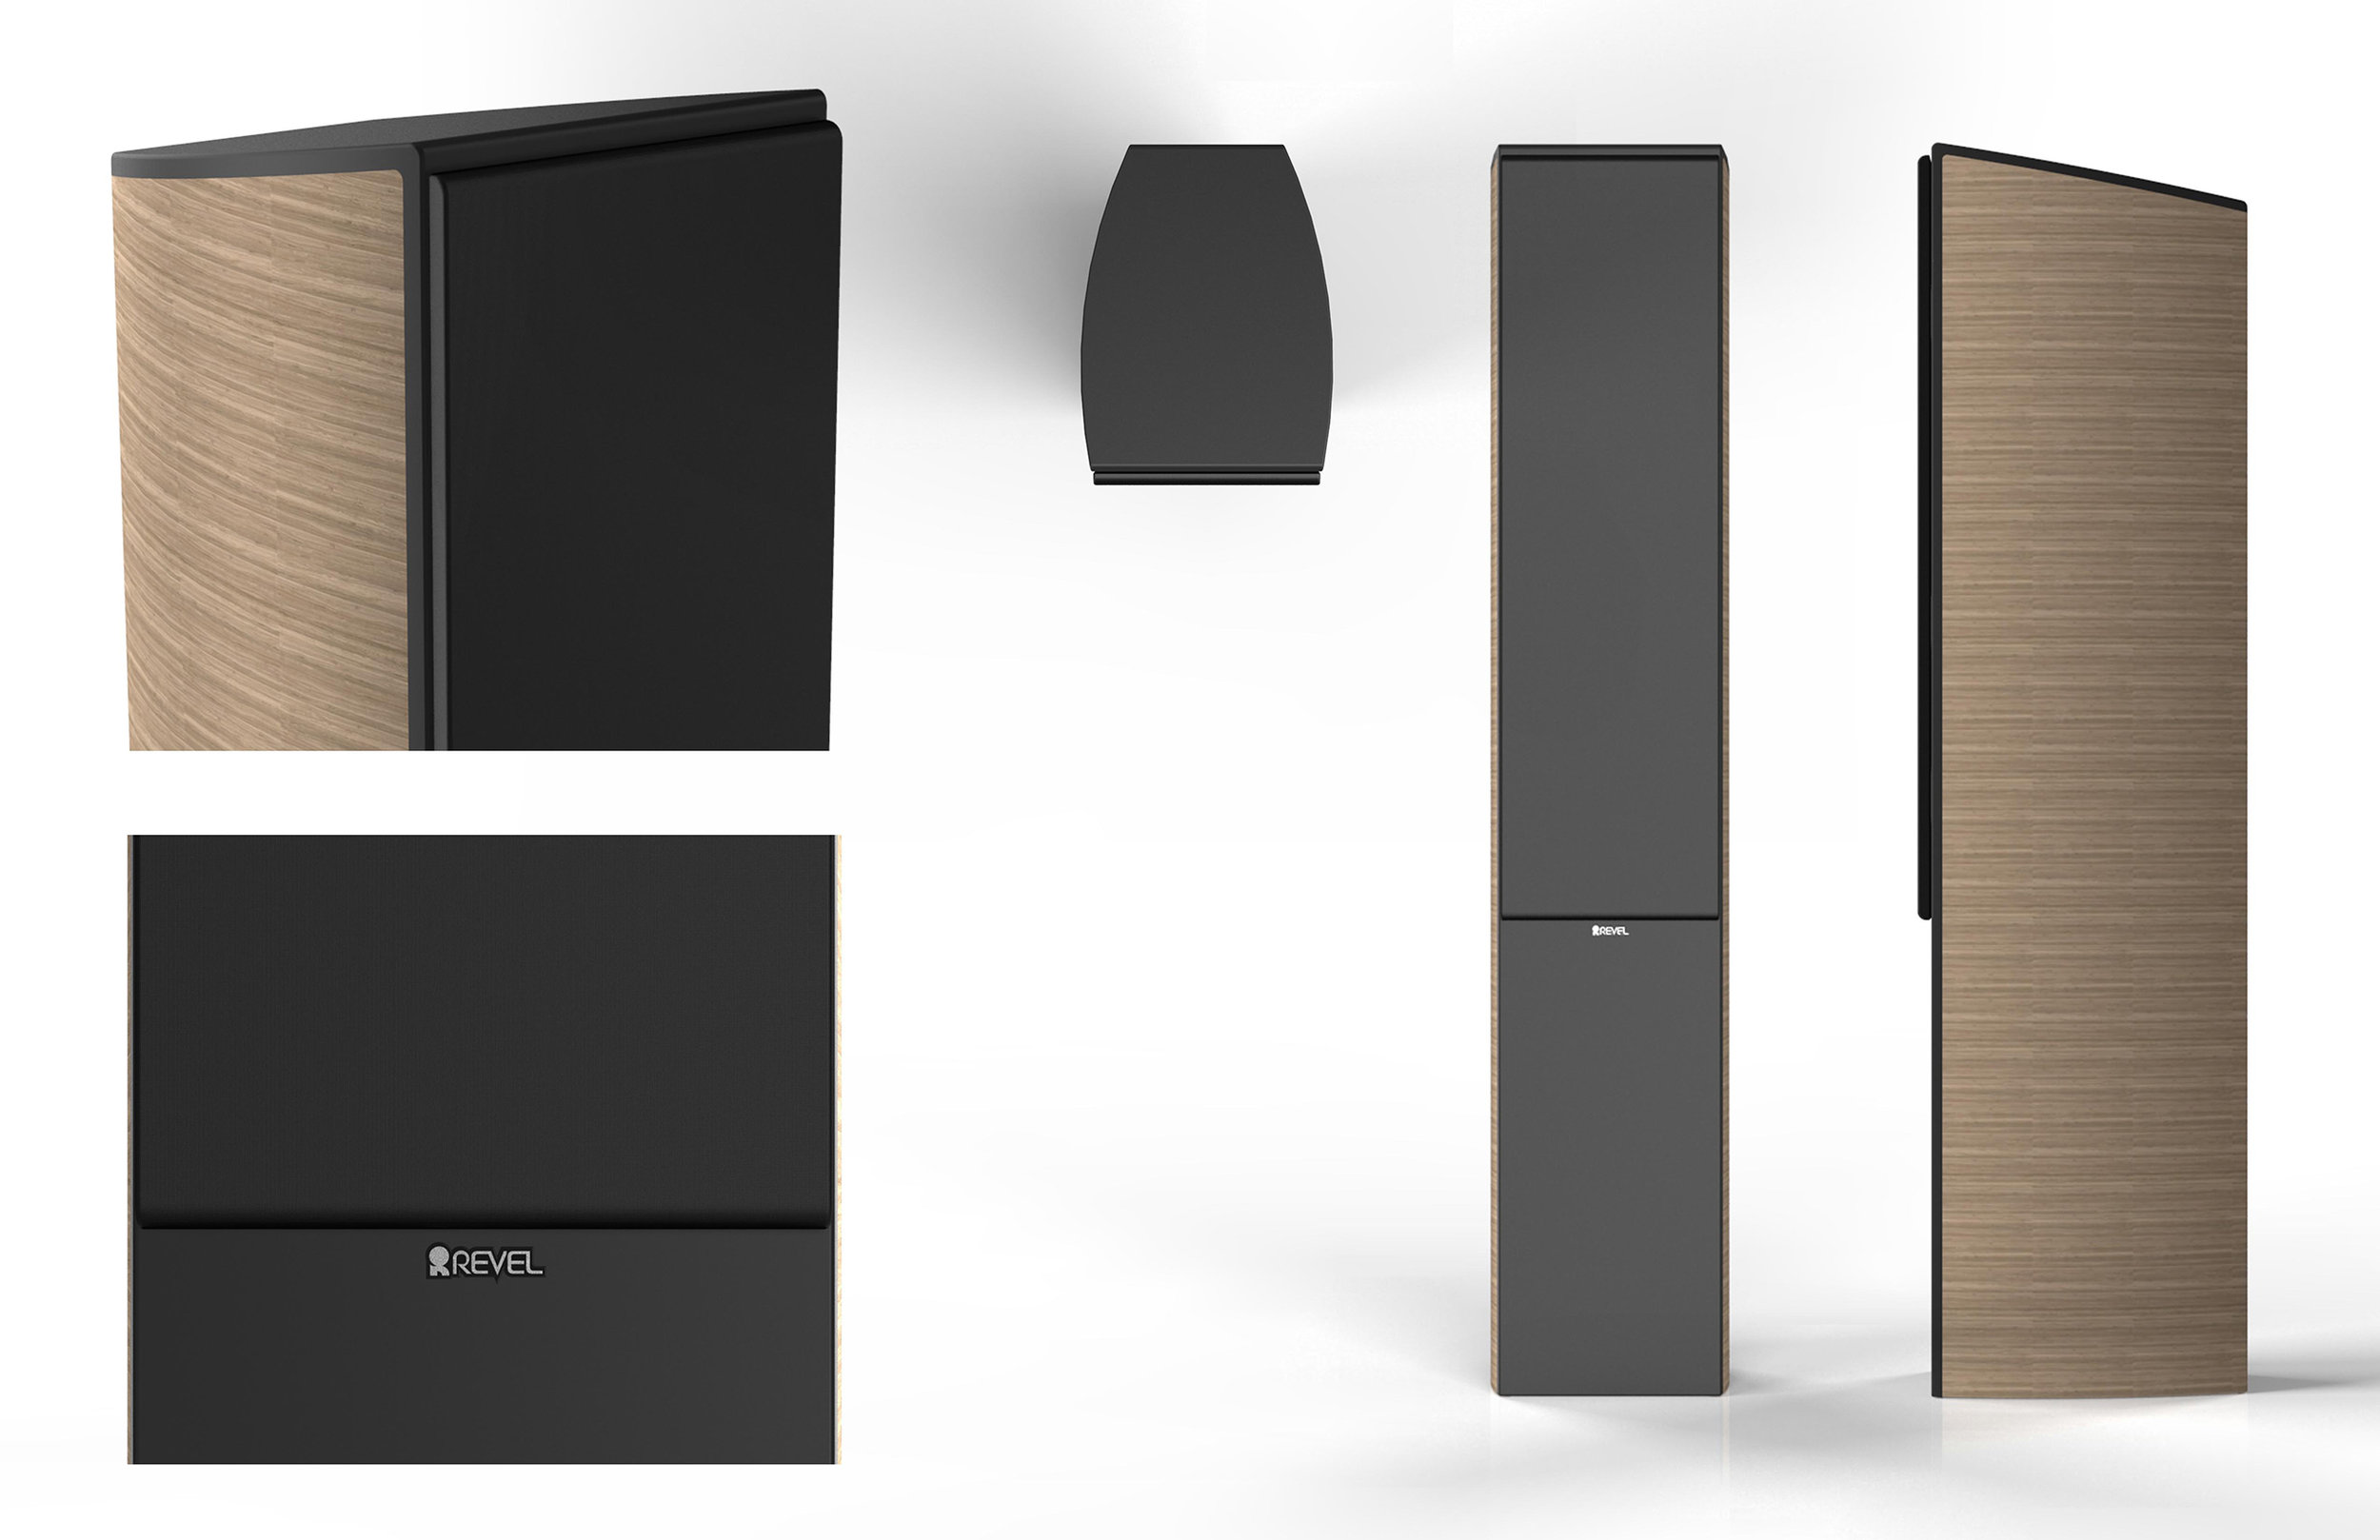 S_Concept 15B_Angled.jpg